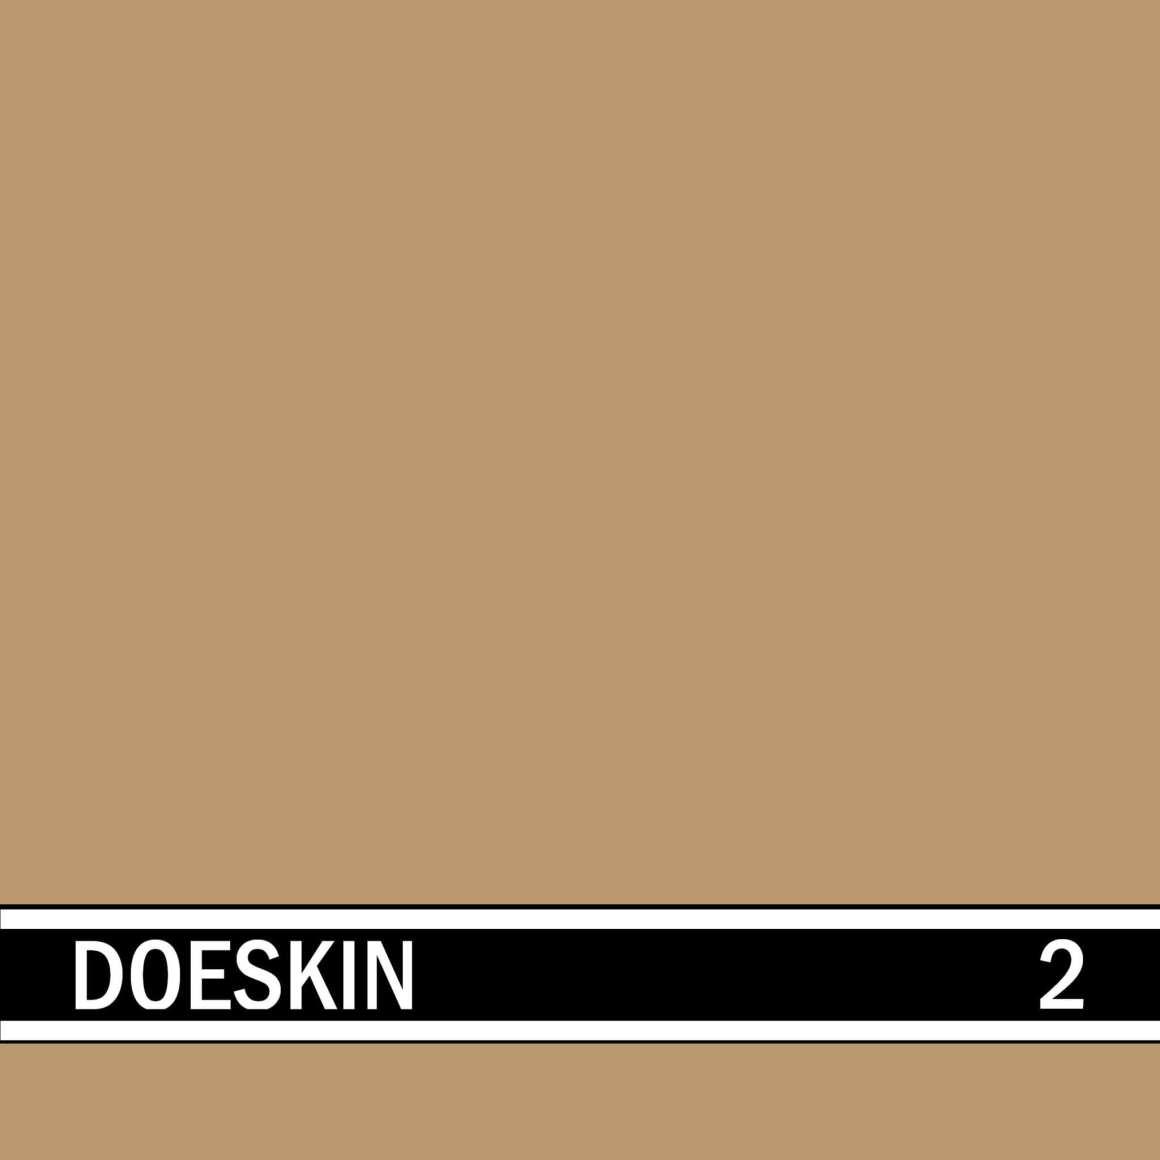 Doeskin integral concrete color for stamped concrete and decorative colored concrete